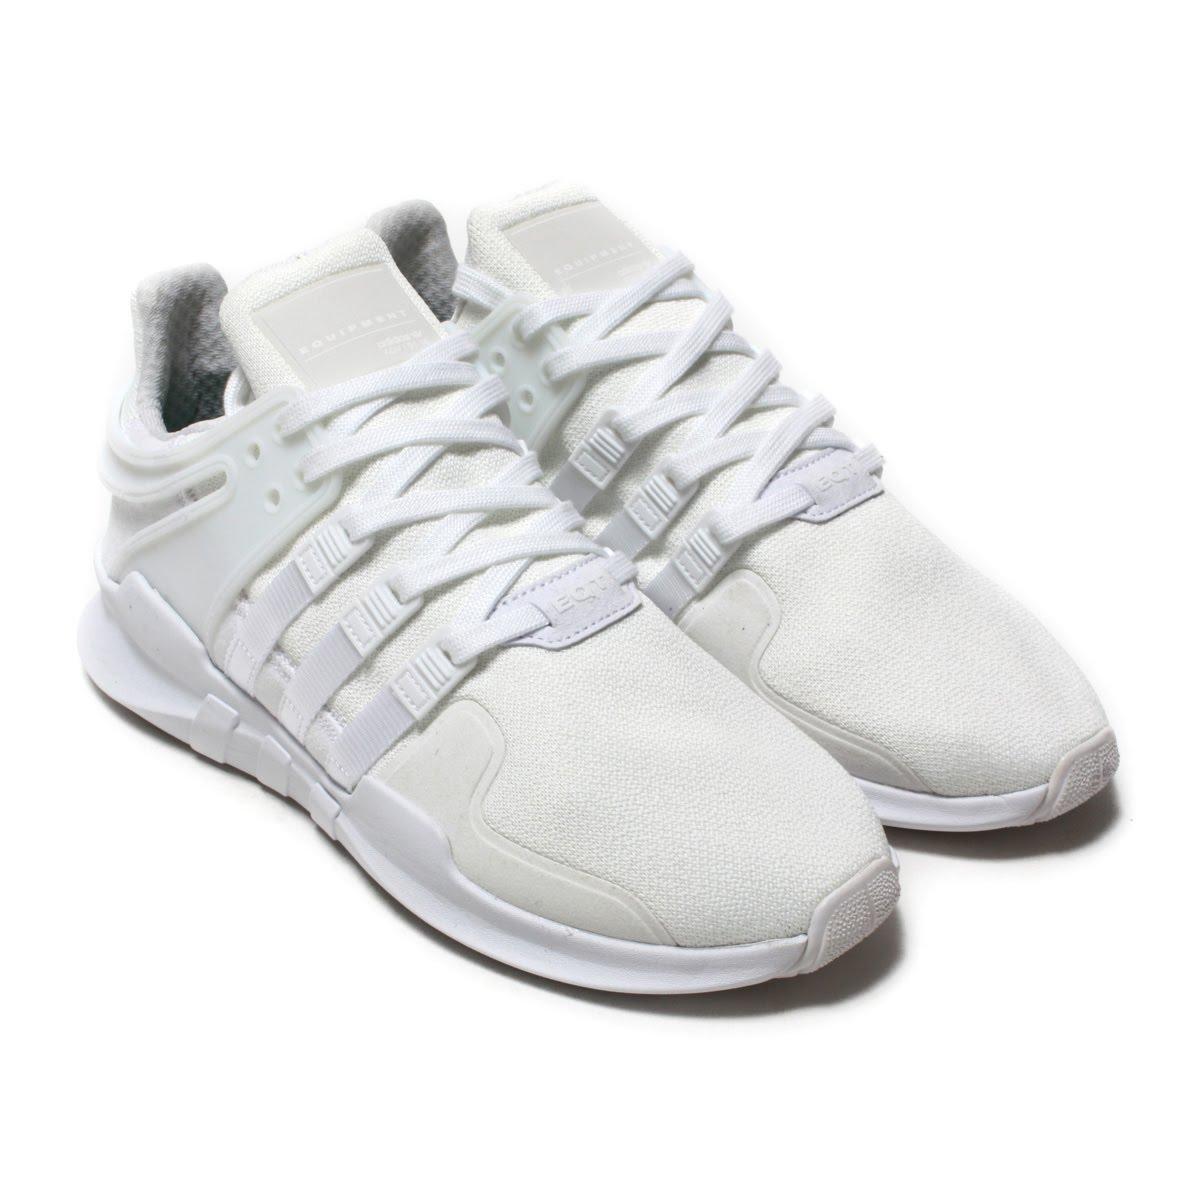 adidas Originals EQT SUPPORT ADV(アディダス オリジナルス イーキューティー サポート ADV)Running White/Running White/Core Black【メンズ レディース スニーカー】18SP-I